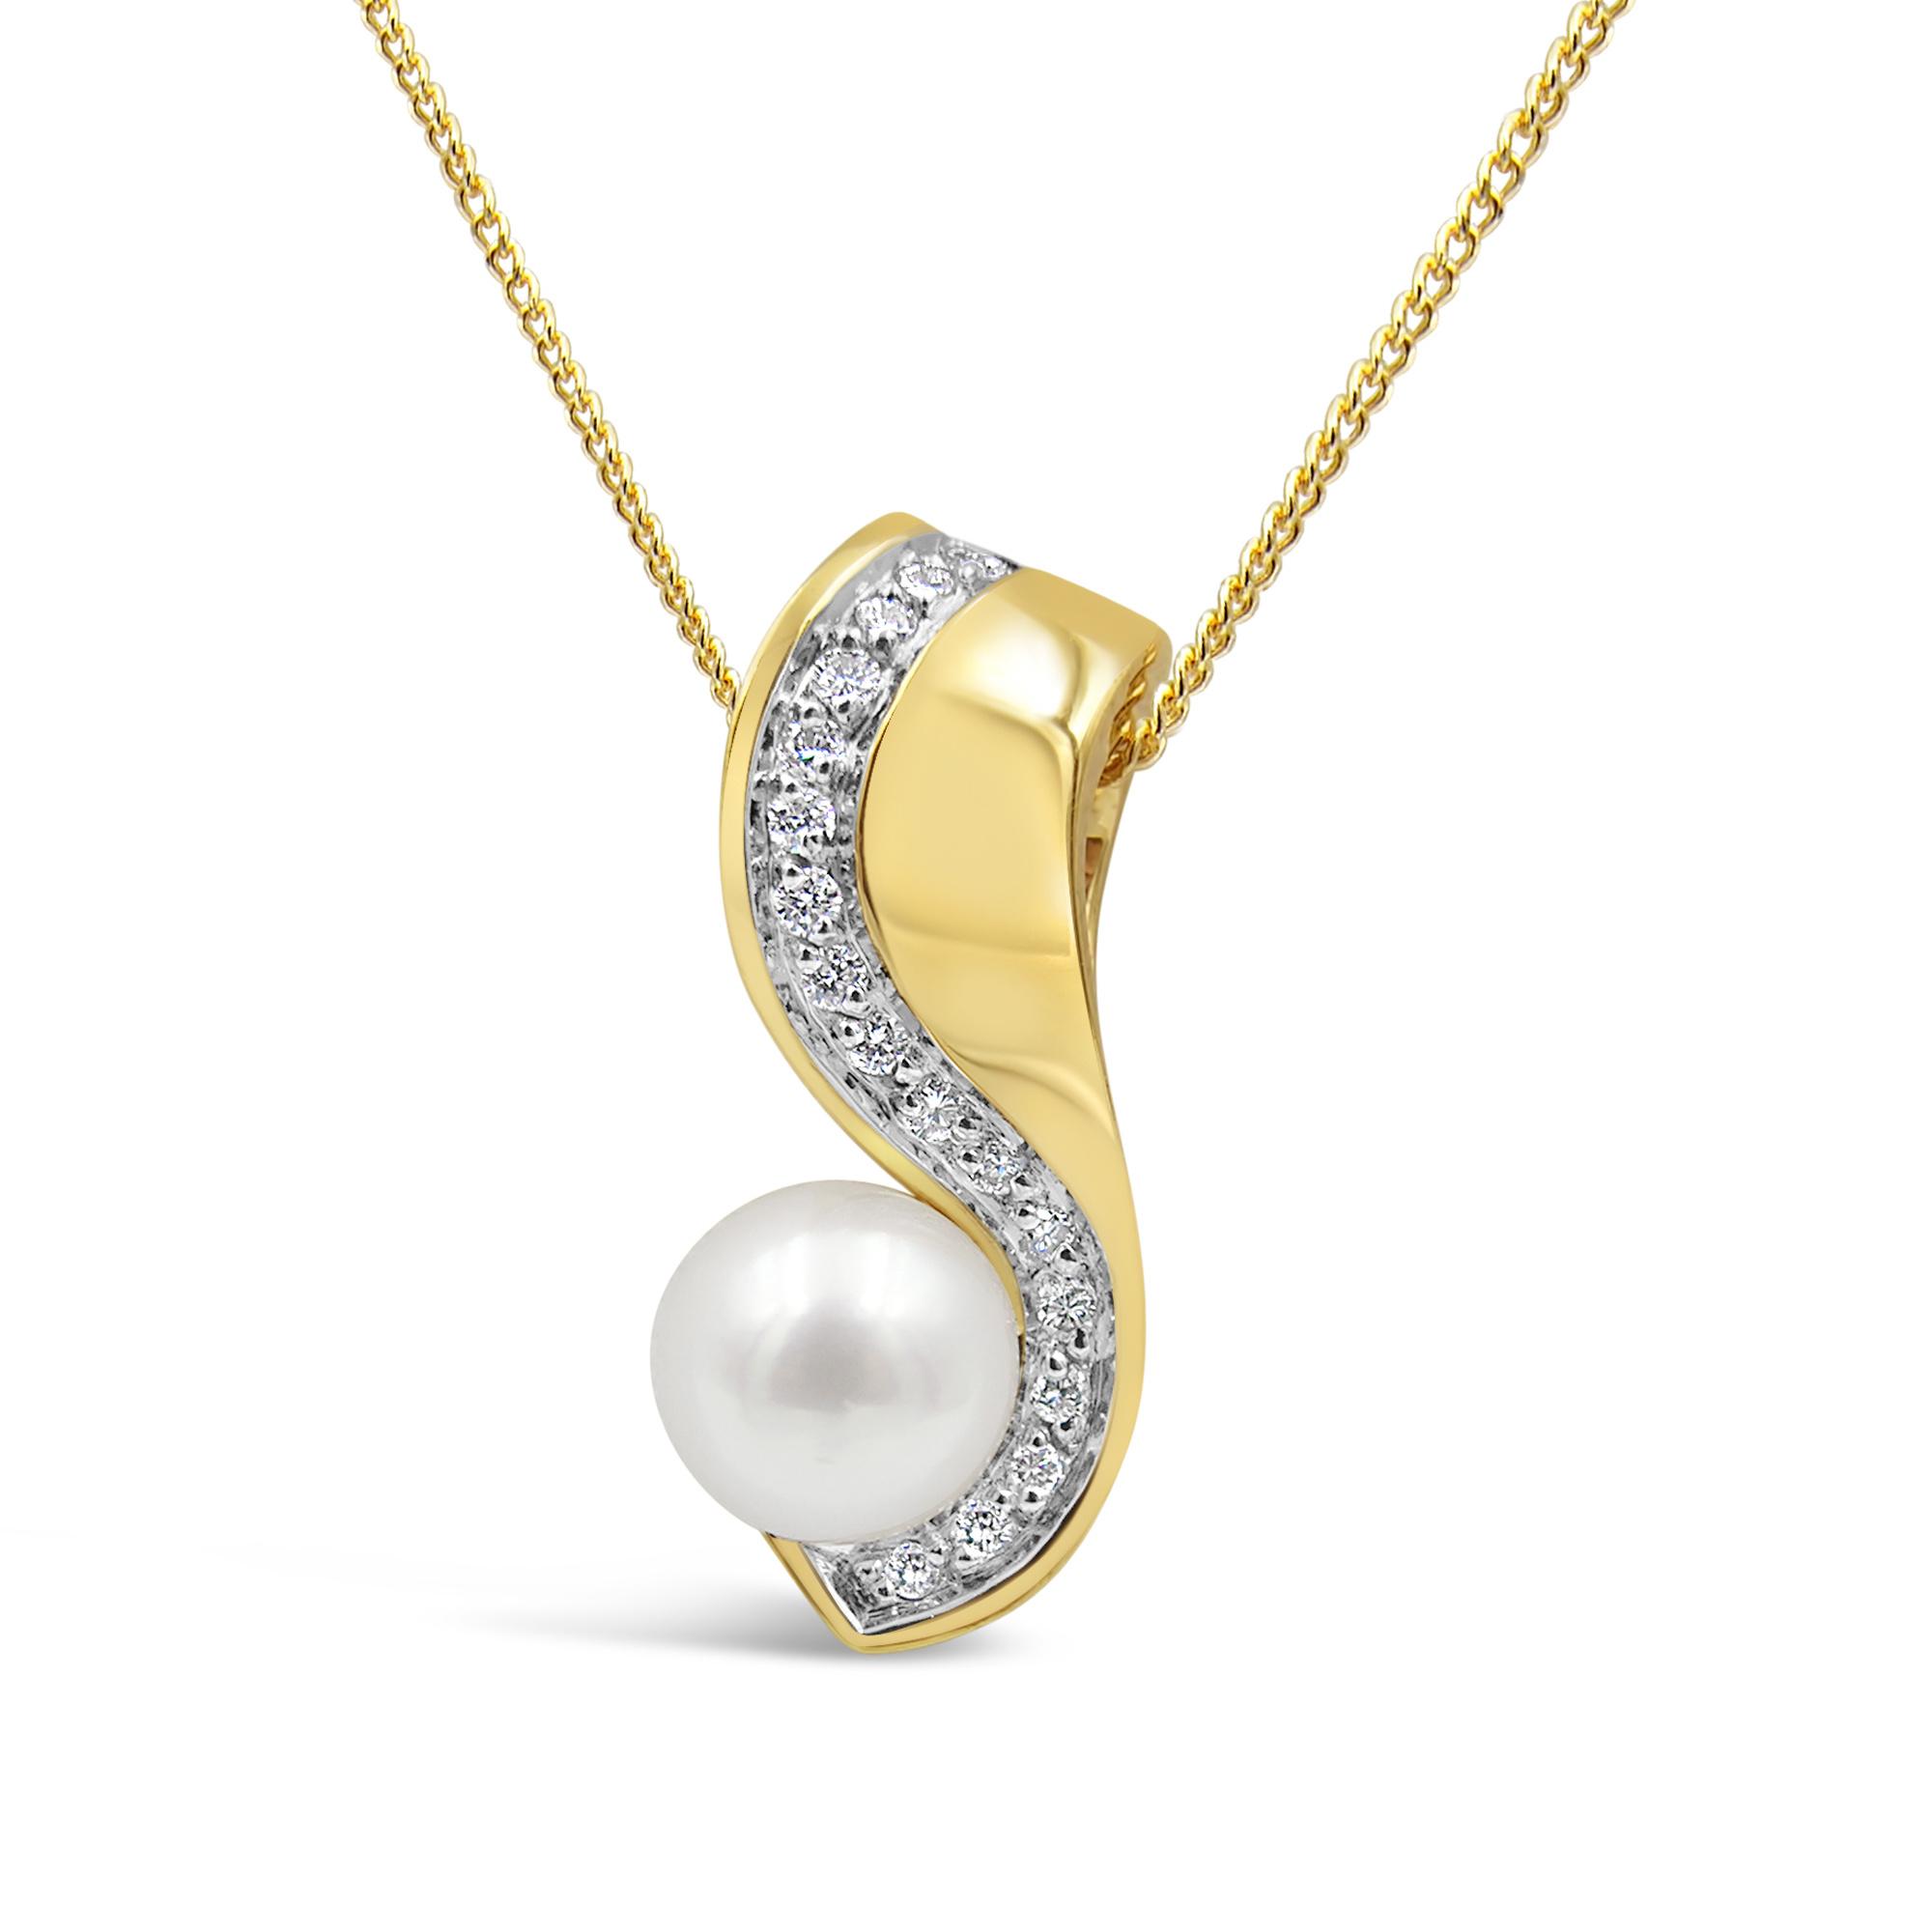 18 karat yellow & white gold pendant with 0.17 ct diamonds & freshwater pearl